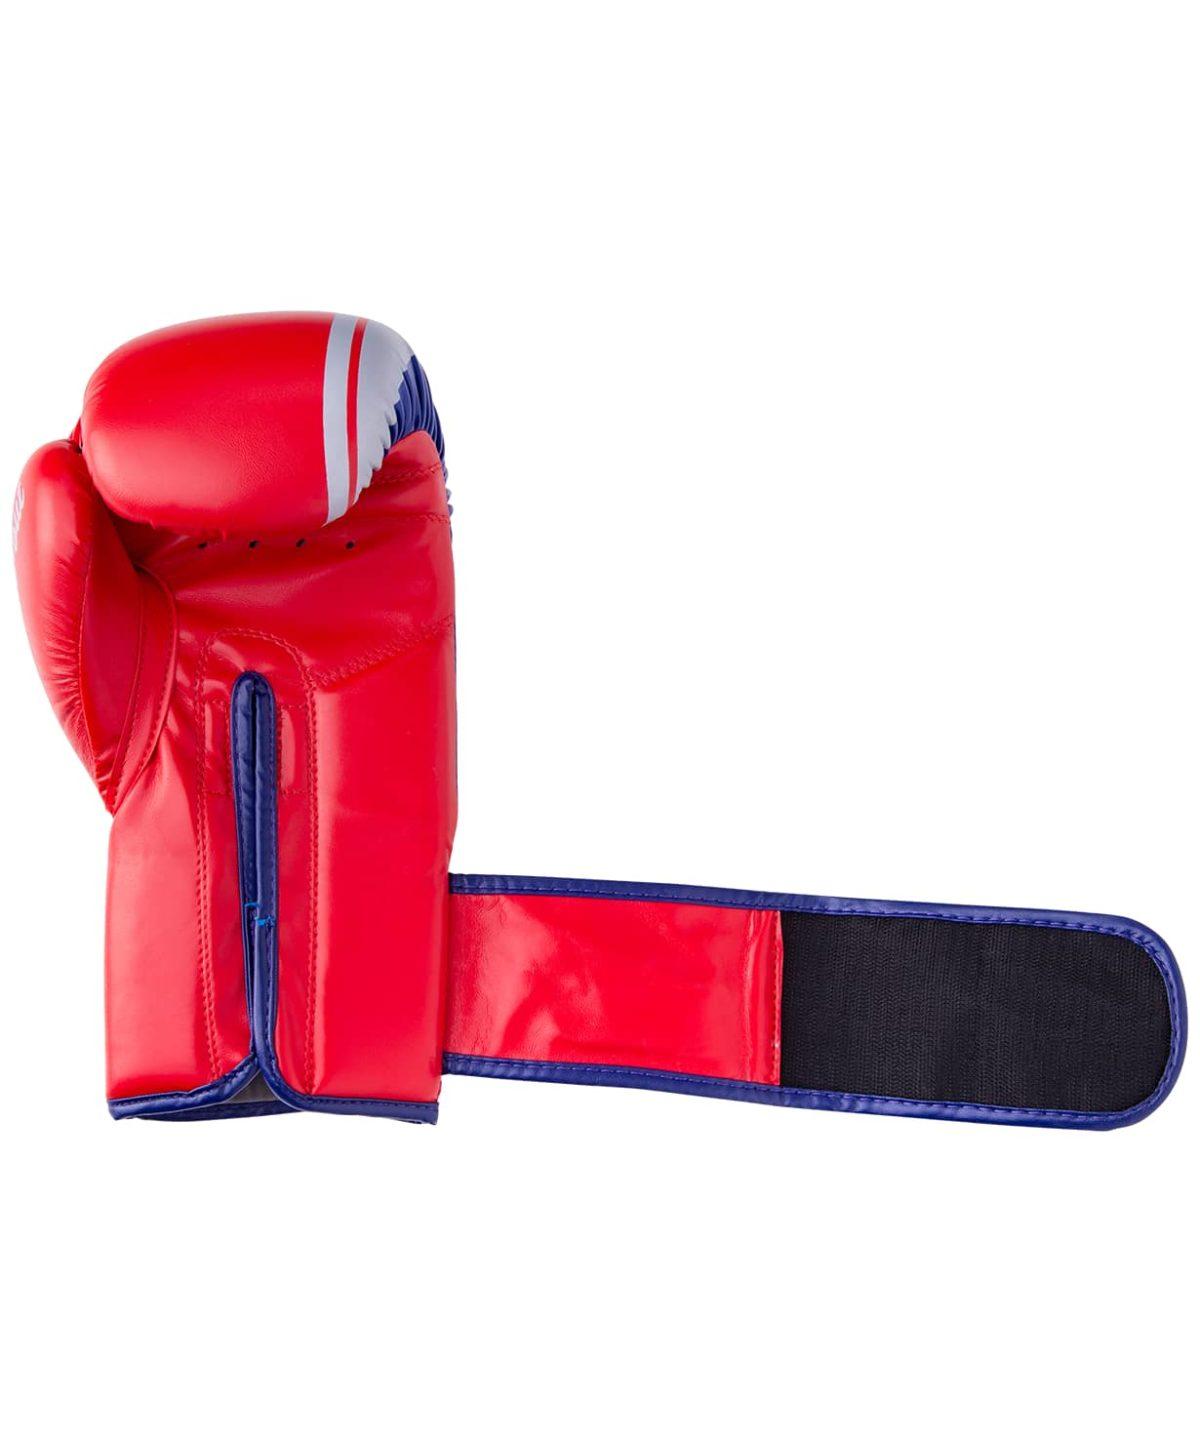 GREEN HILL Перчатки боксерские 8 oz Knockout  BGK-2266: красный - 2